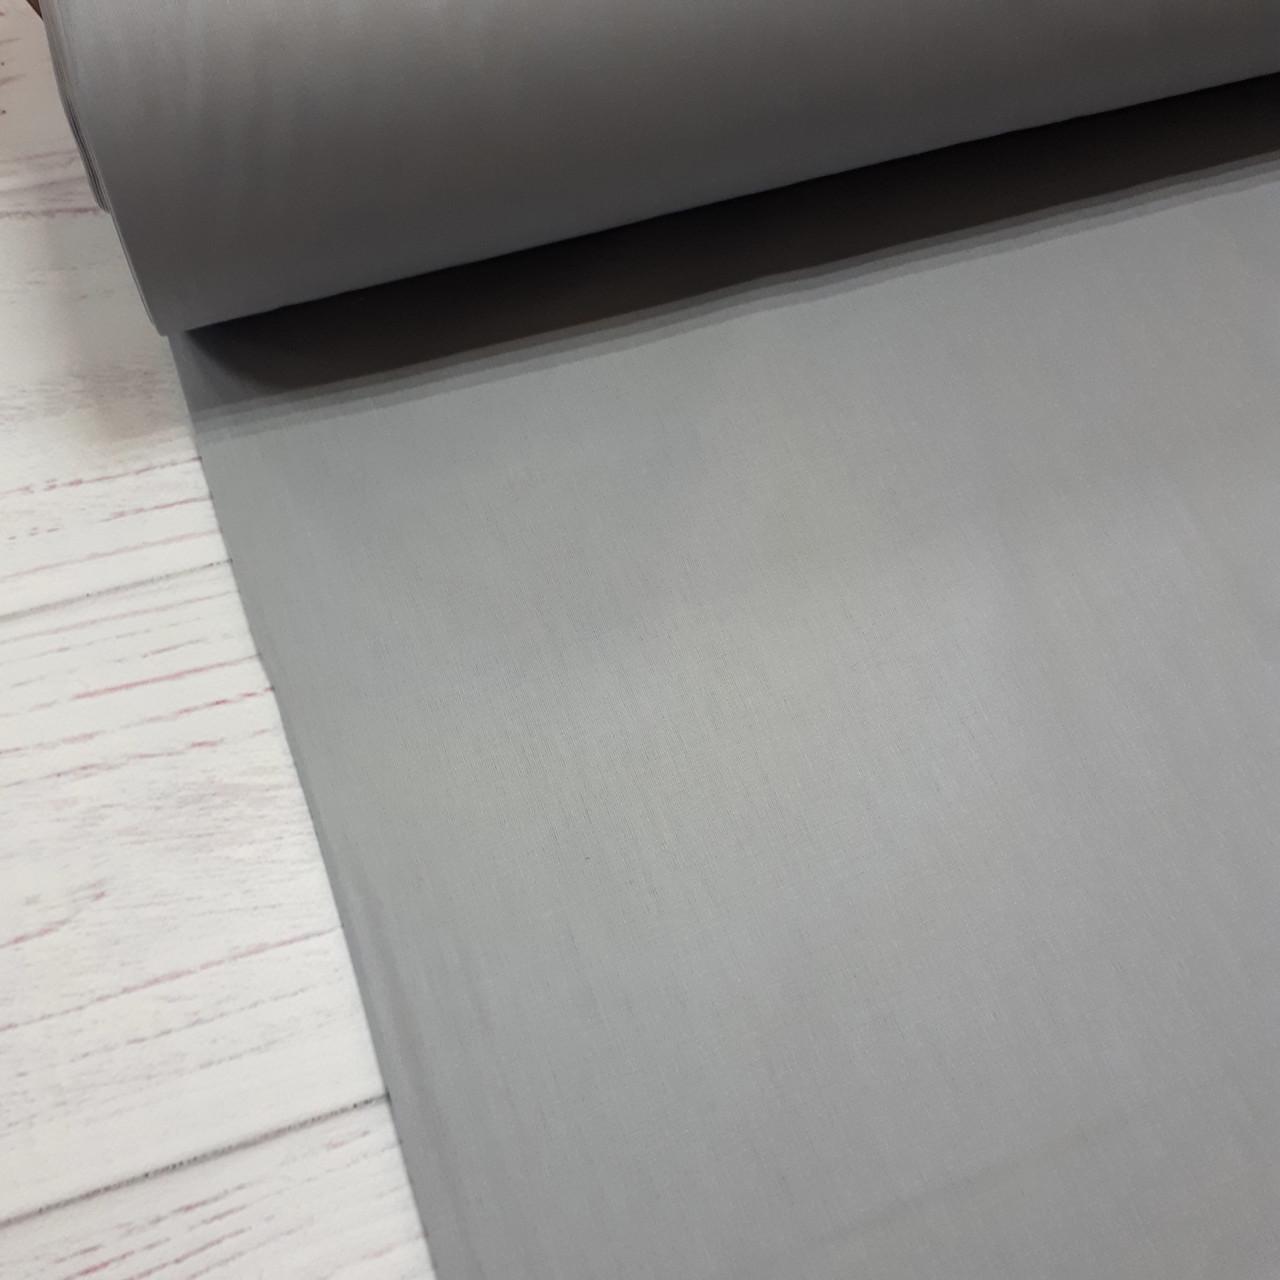 Ткань поплин De Luxe, однотонный серый (Турция шир. 2,4 м) №32-52b